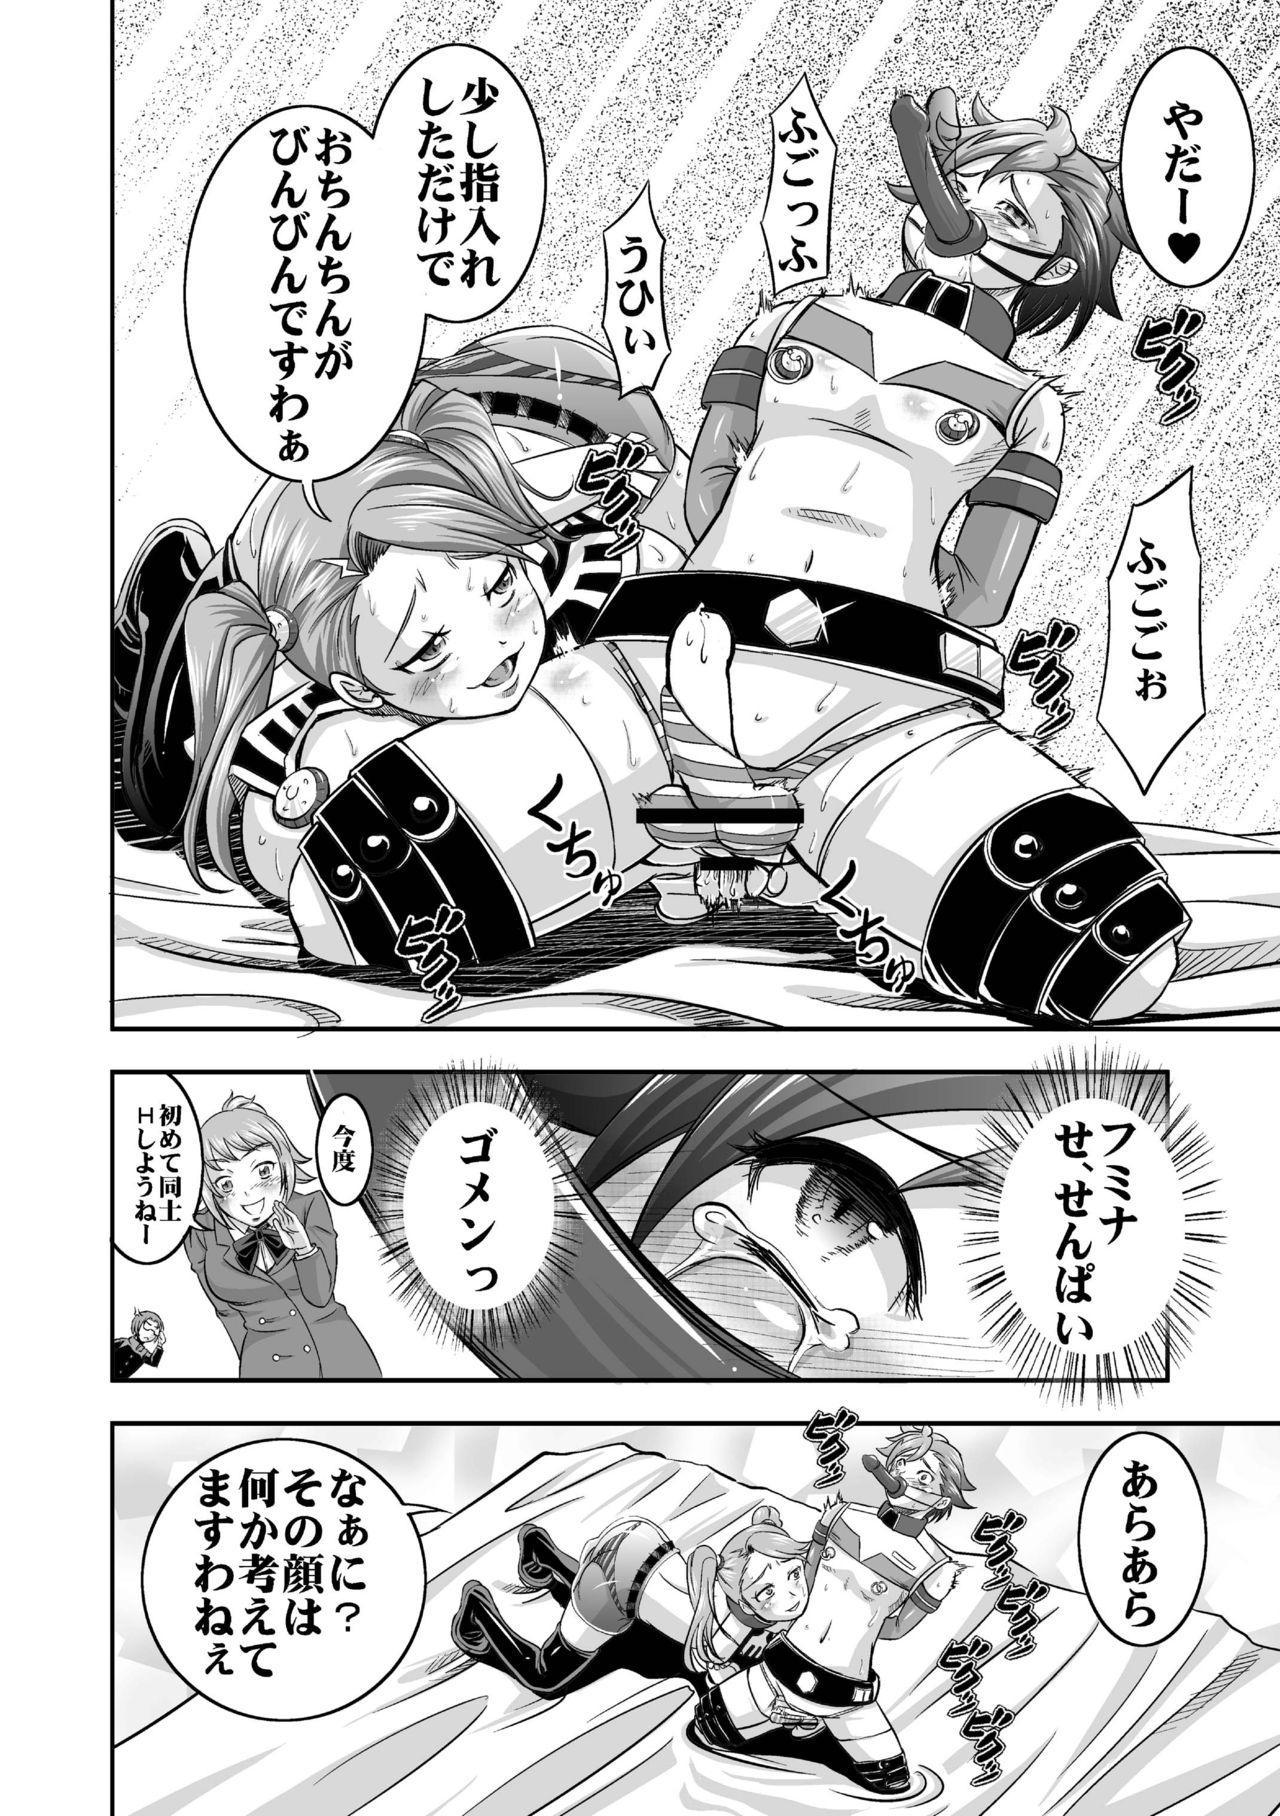 [Nisepakudo (Nisepakuman-san)] Plamo-kyou Chijo 3 -Futomashi- (Gundam Build Fighters Try) [Digital] 9